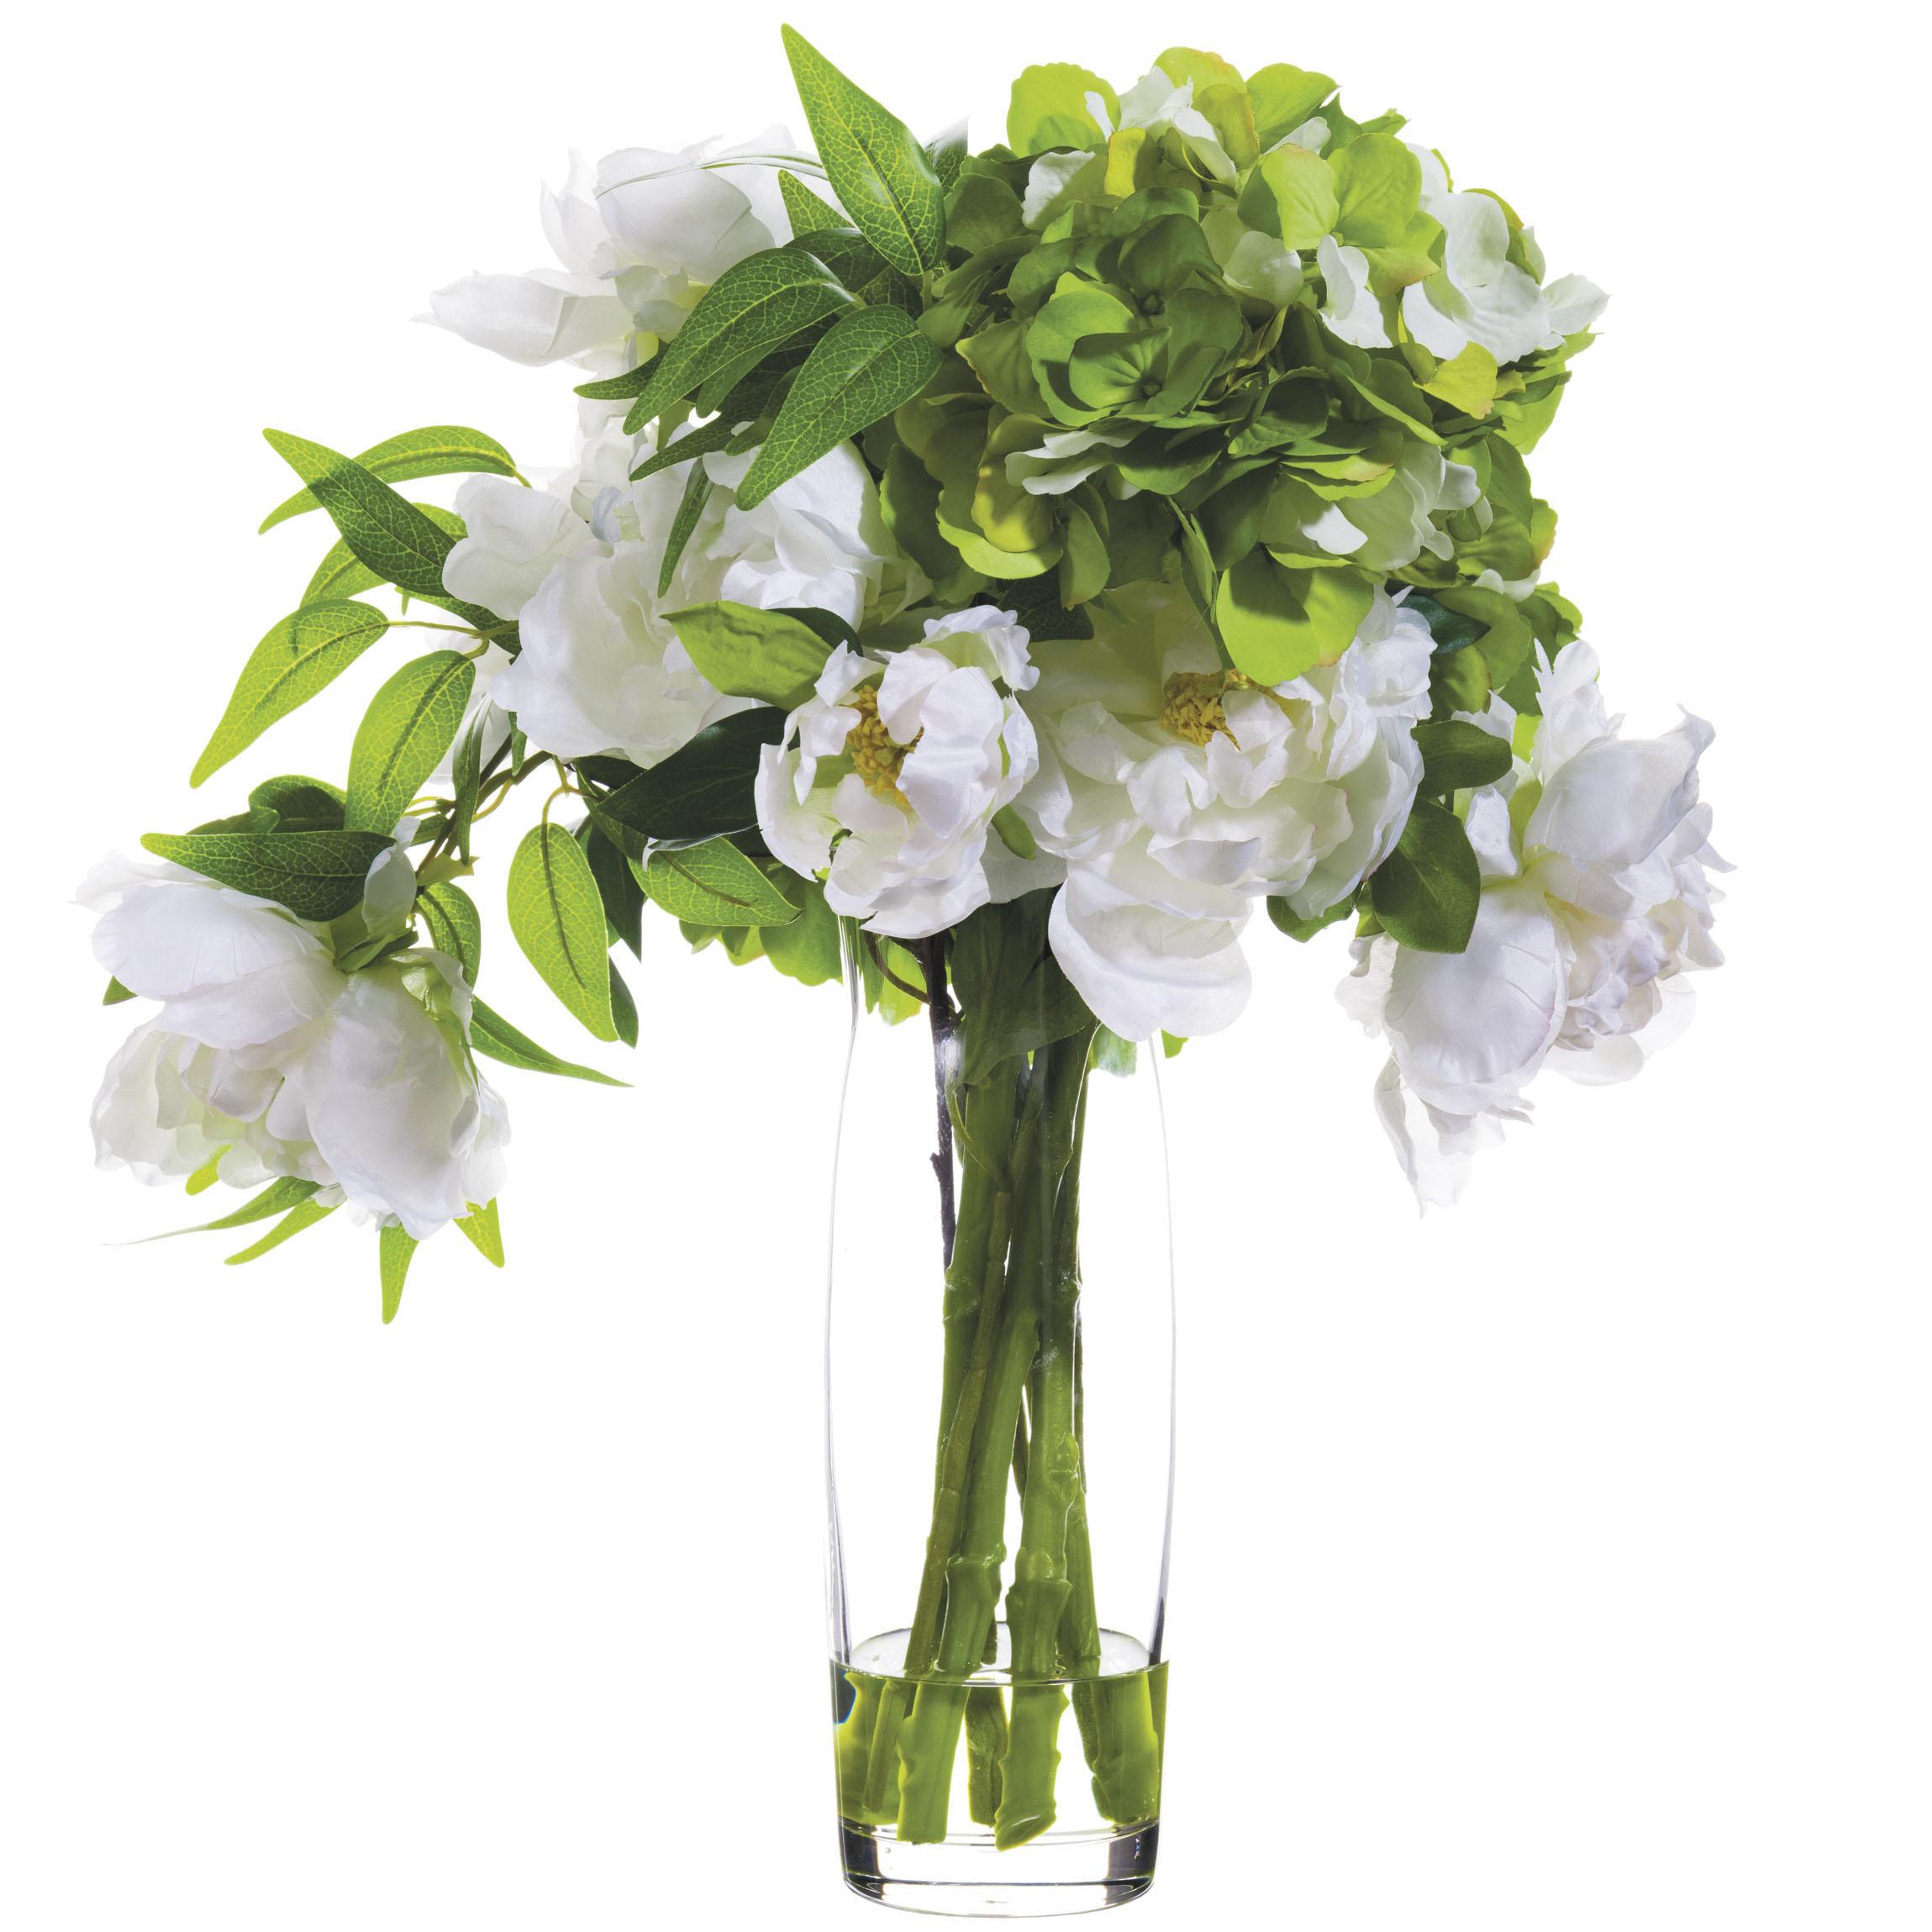 19 Inch Artificial White Hydrangea In Glass Vase